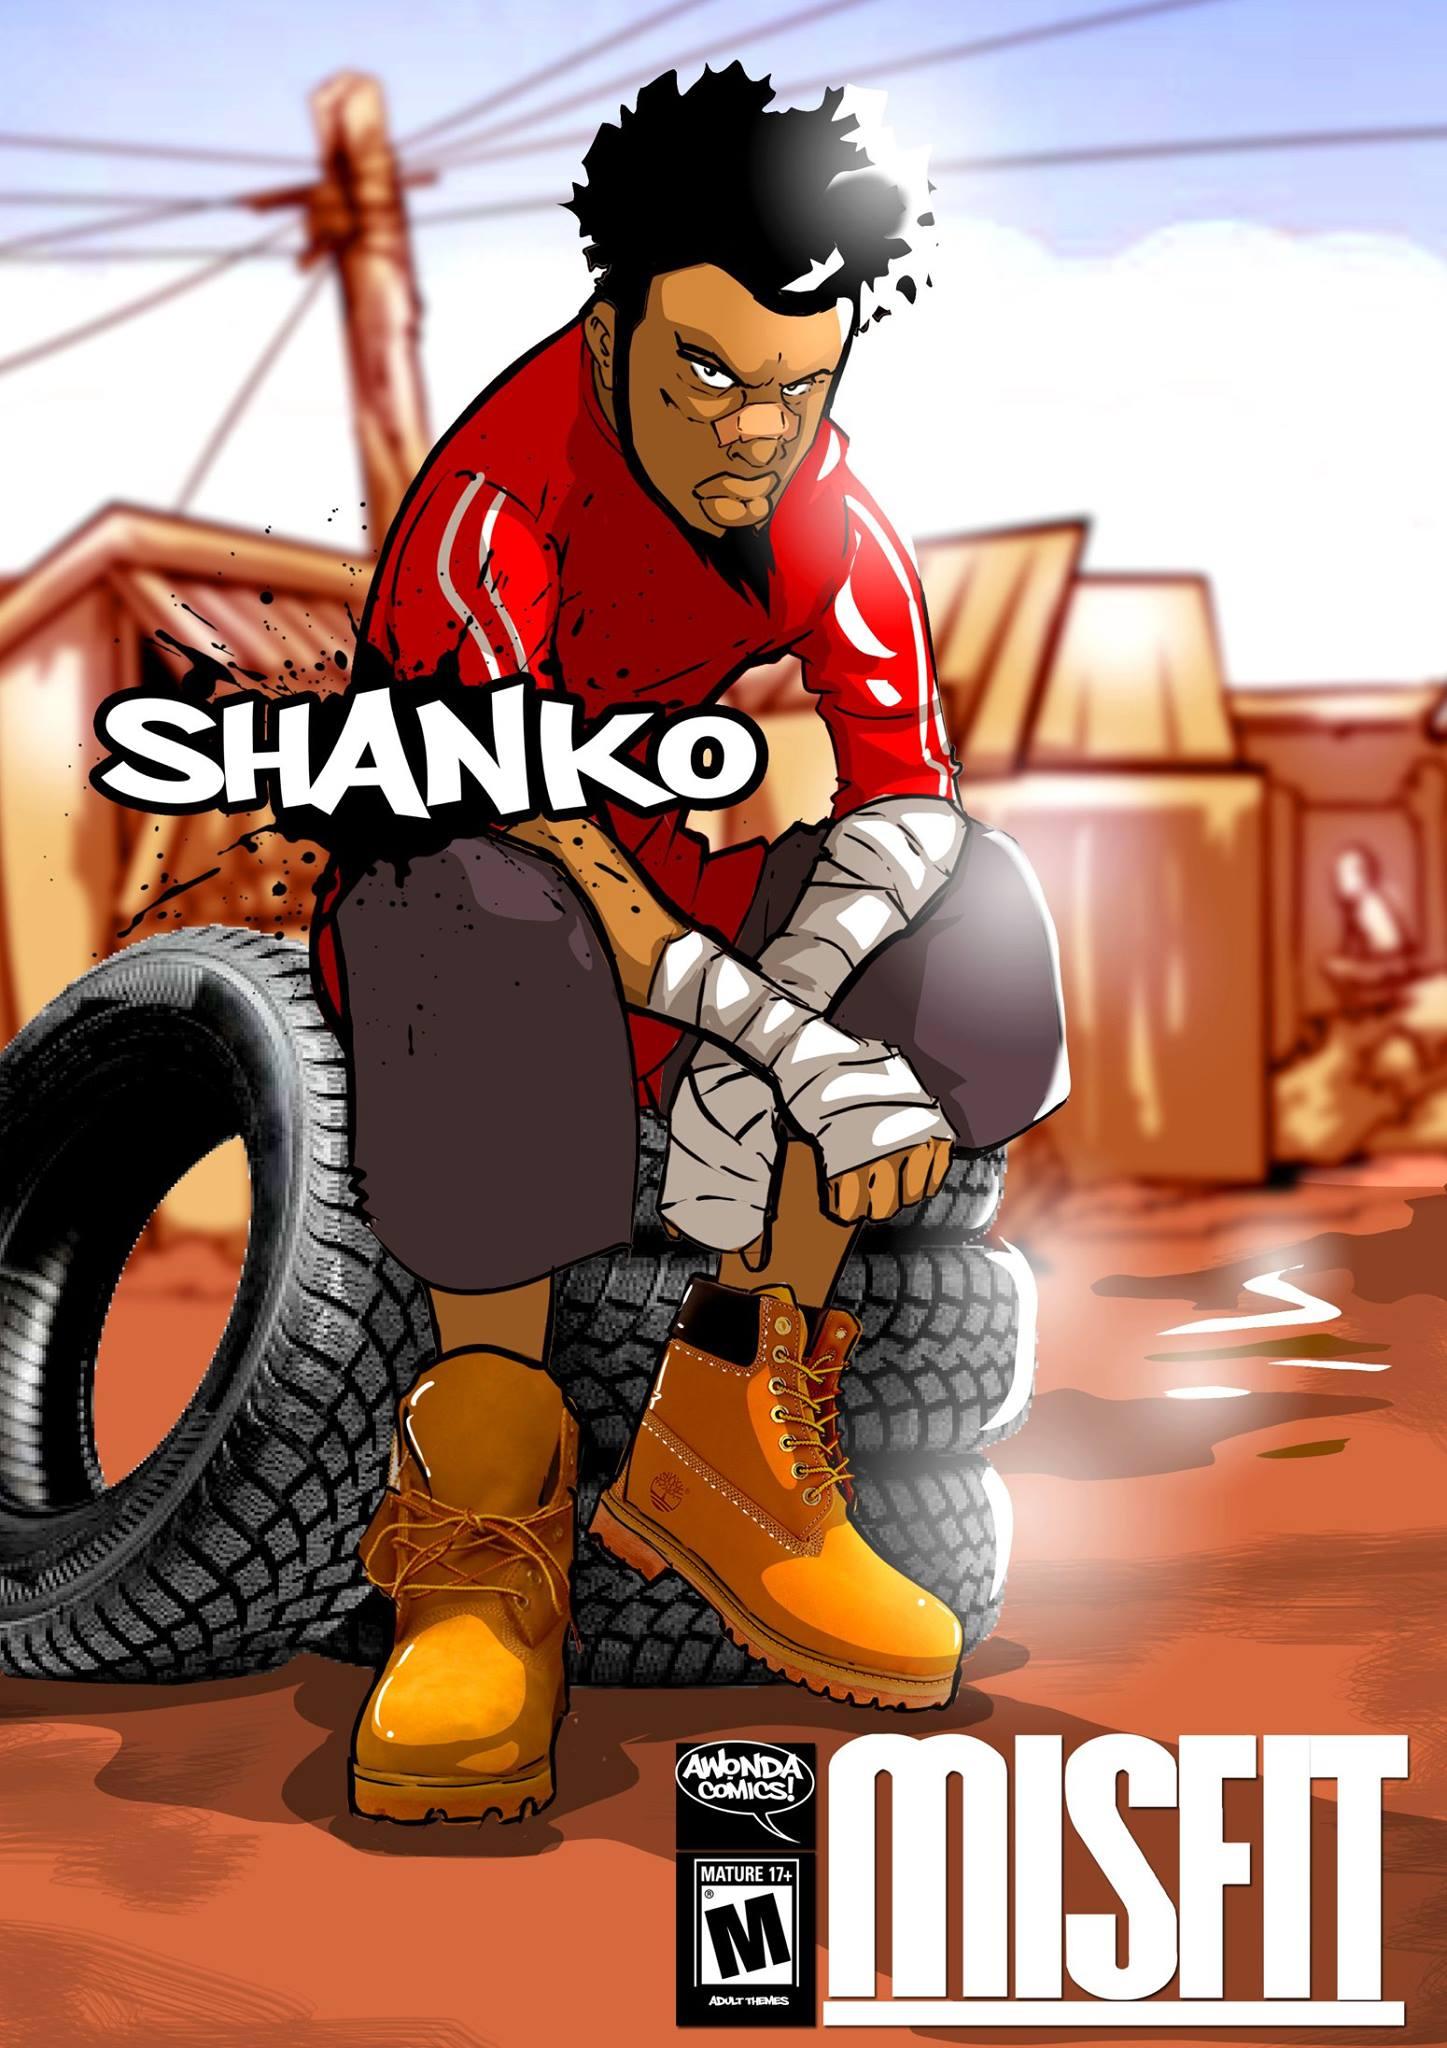 Shanko from Misfit